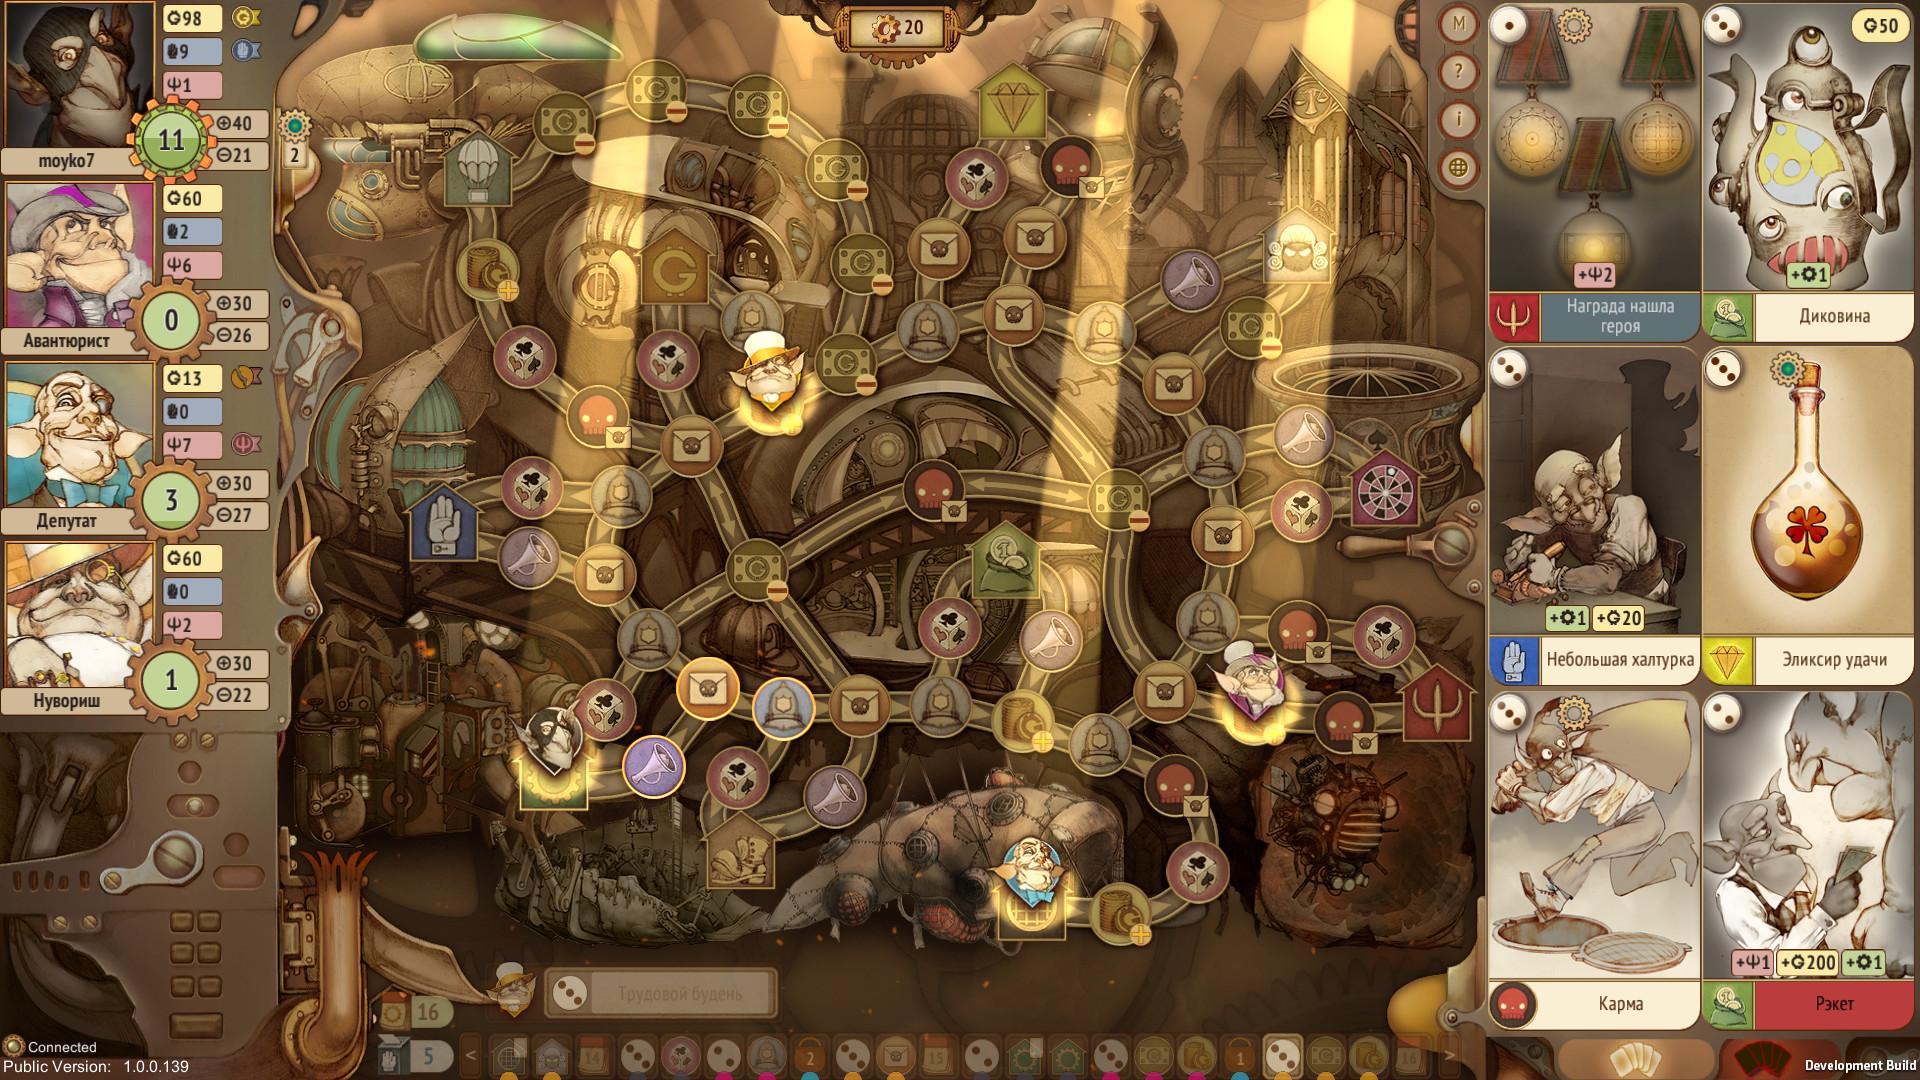 Mystic secrets novomatic ігровий автомат